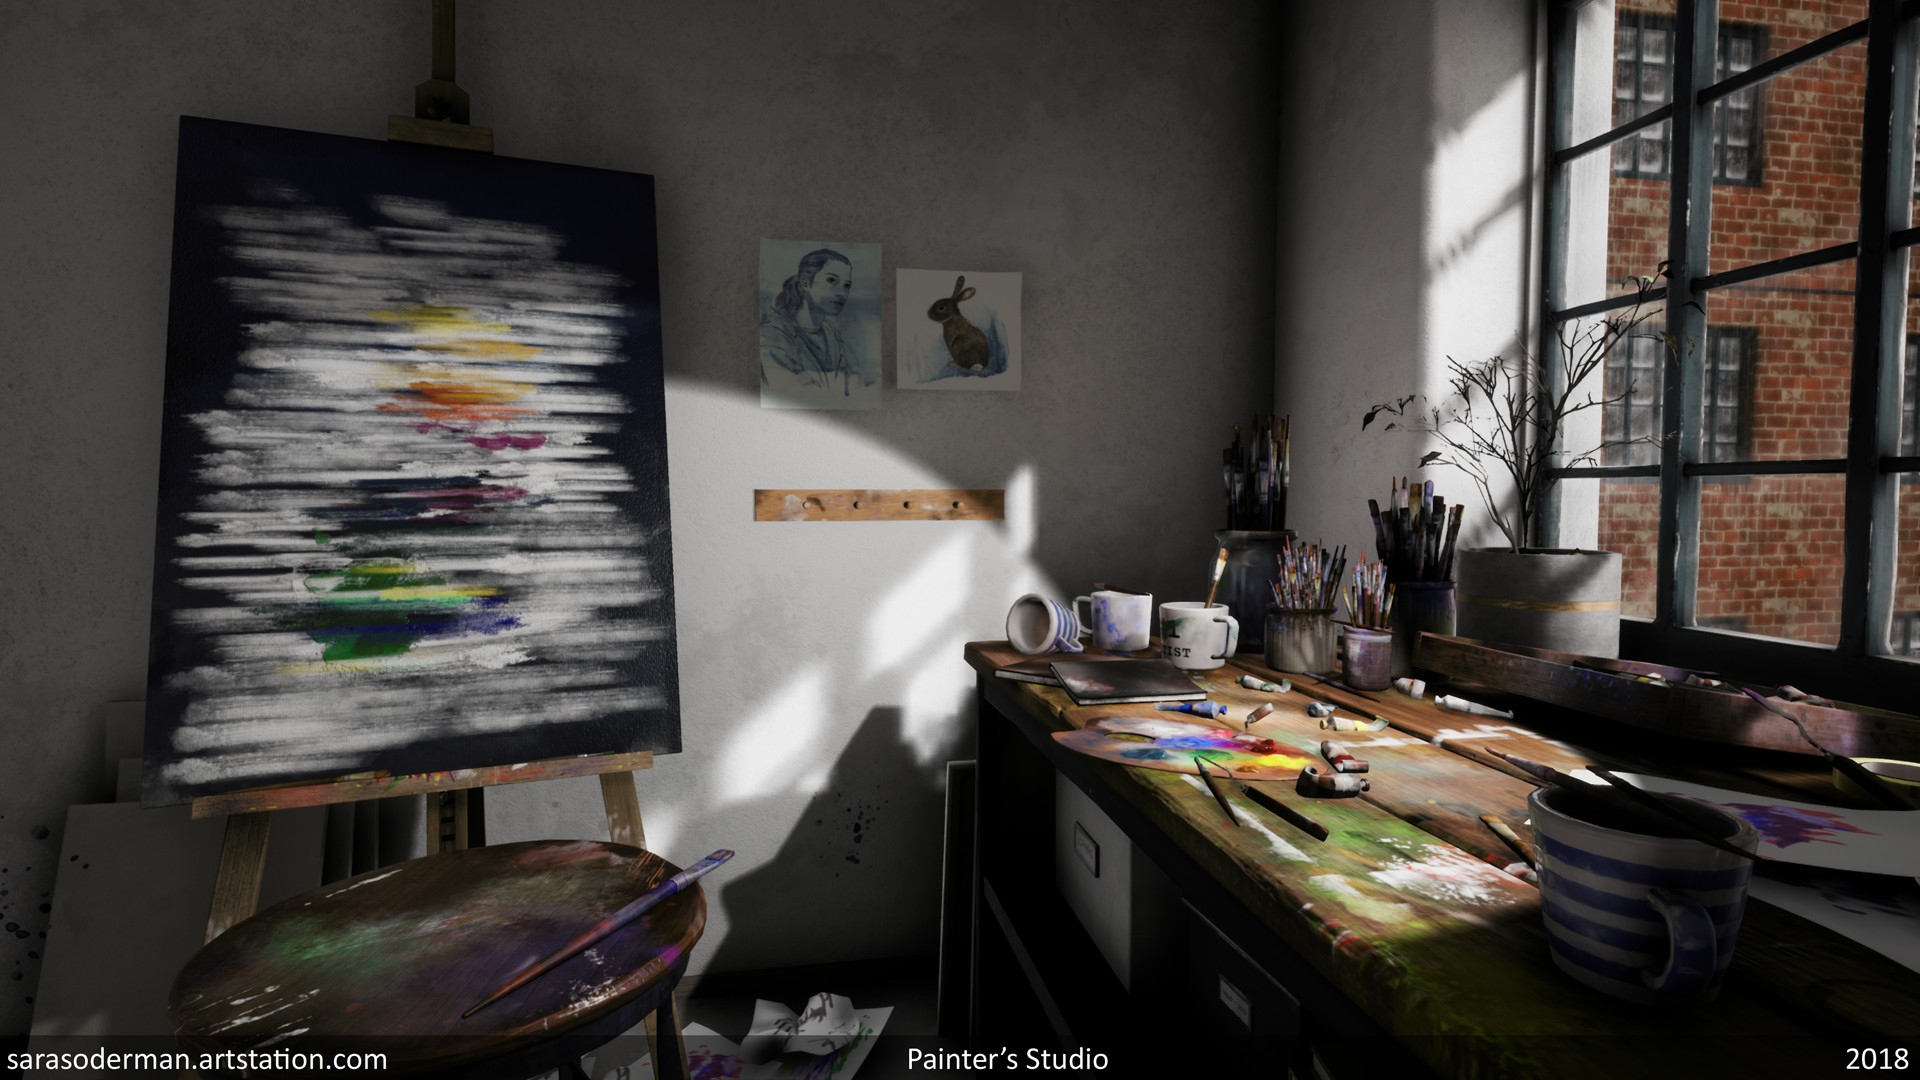 Sara soderman paintrender 03